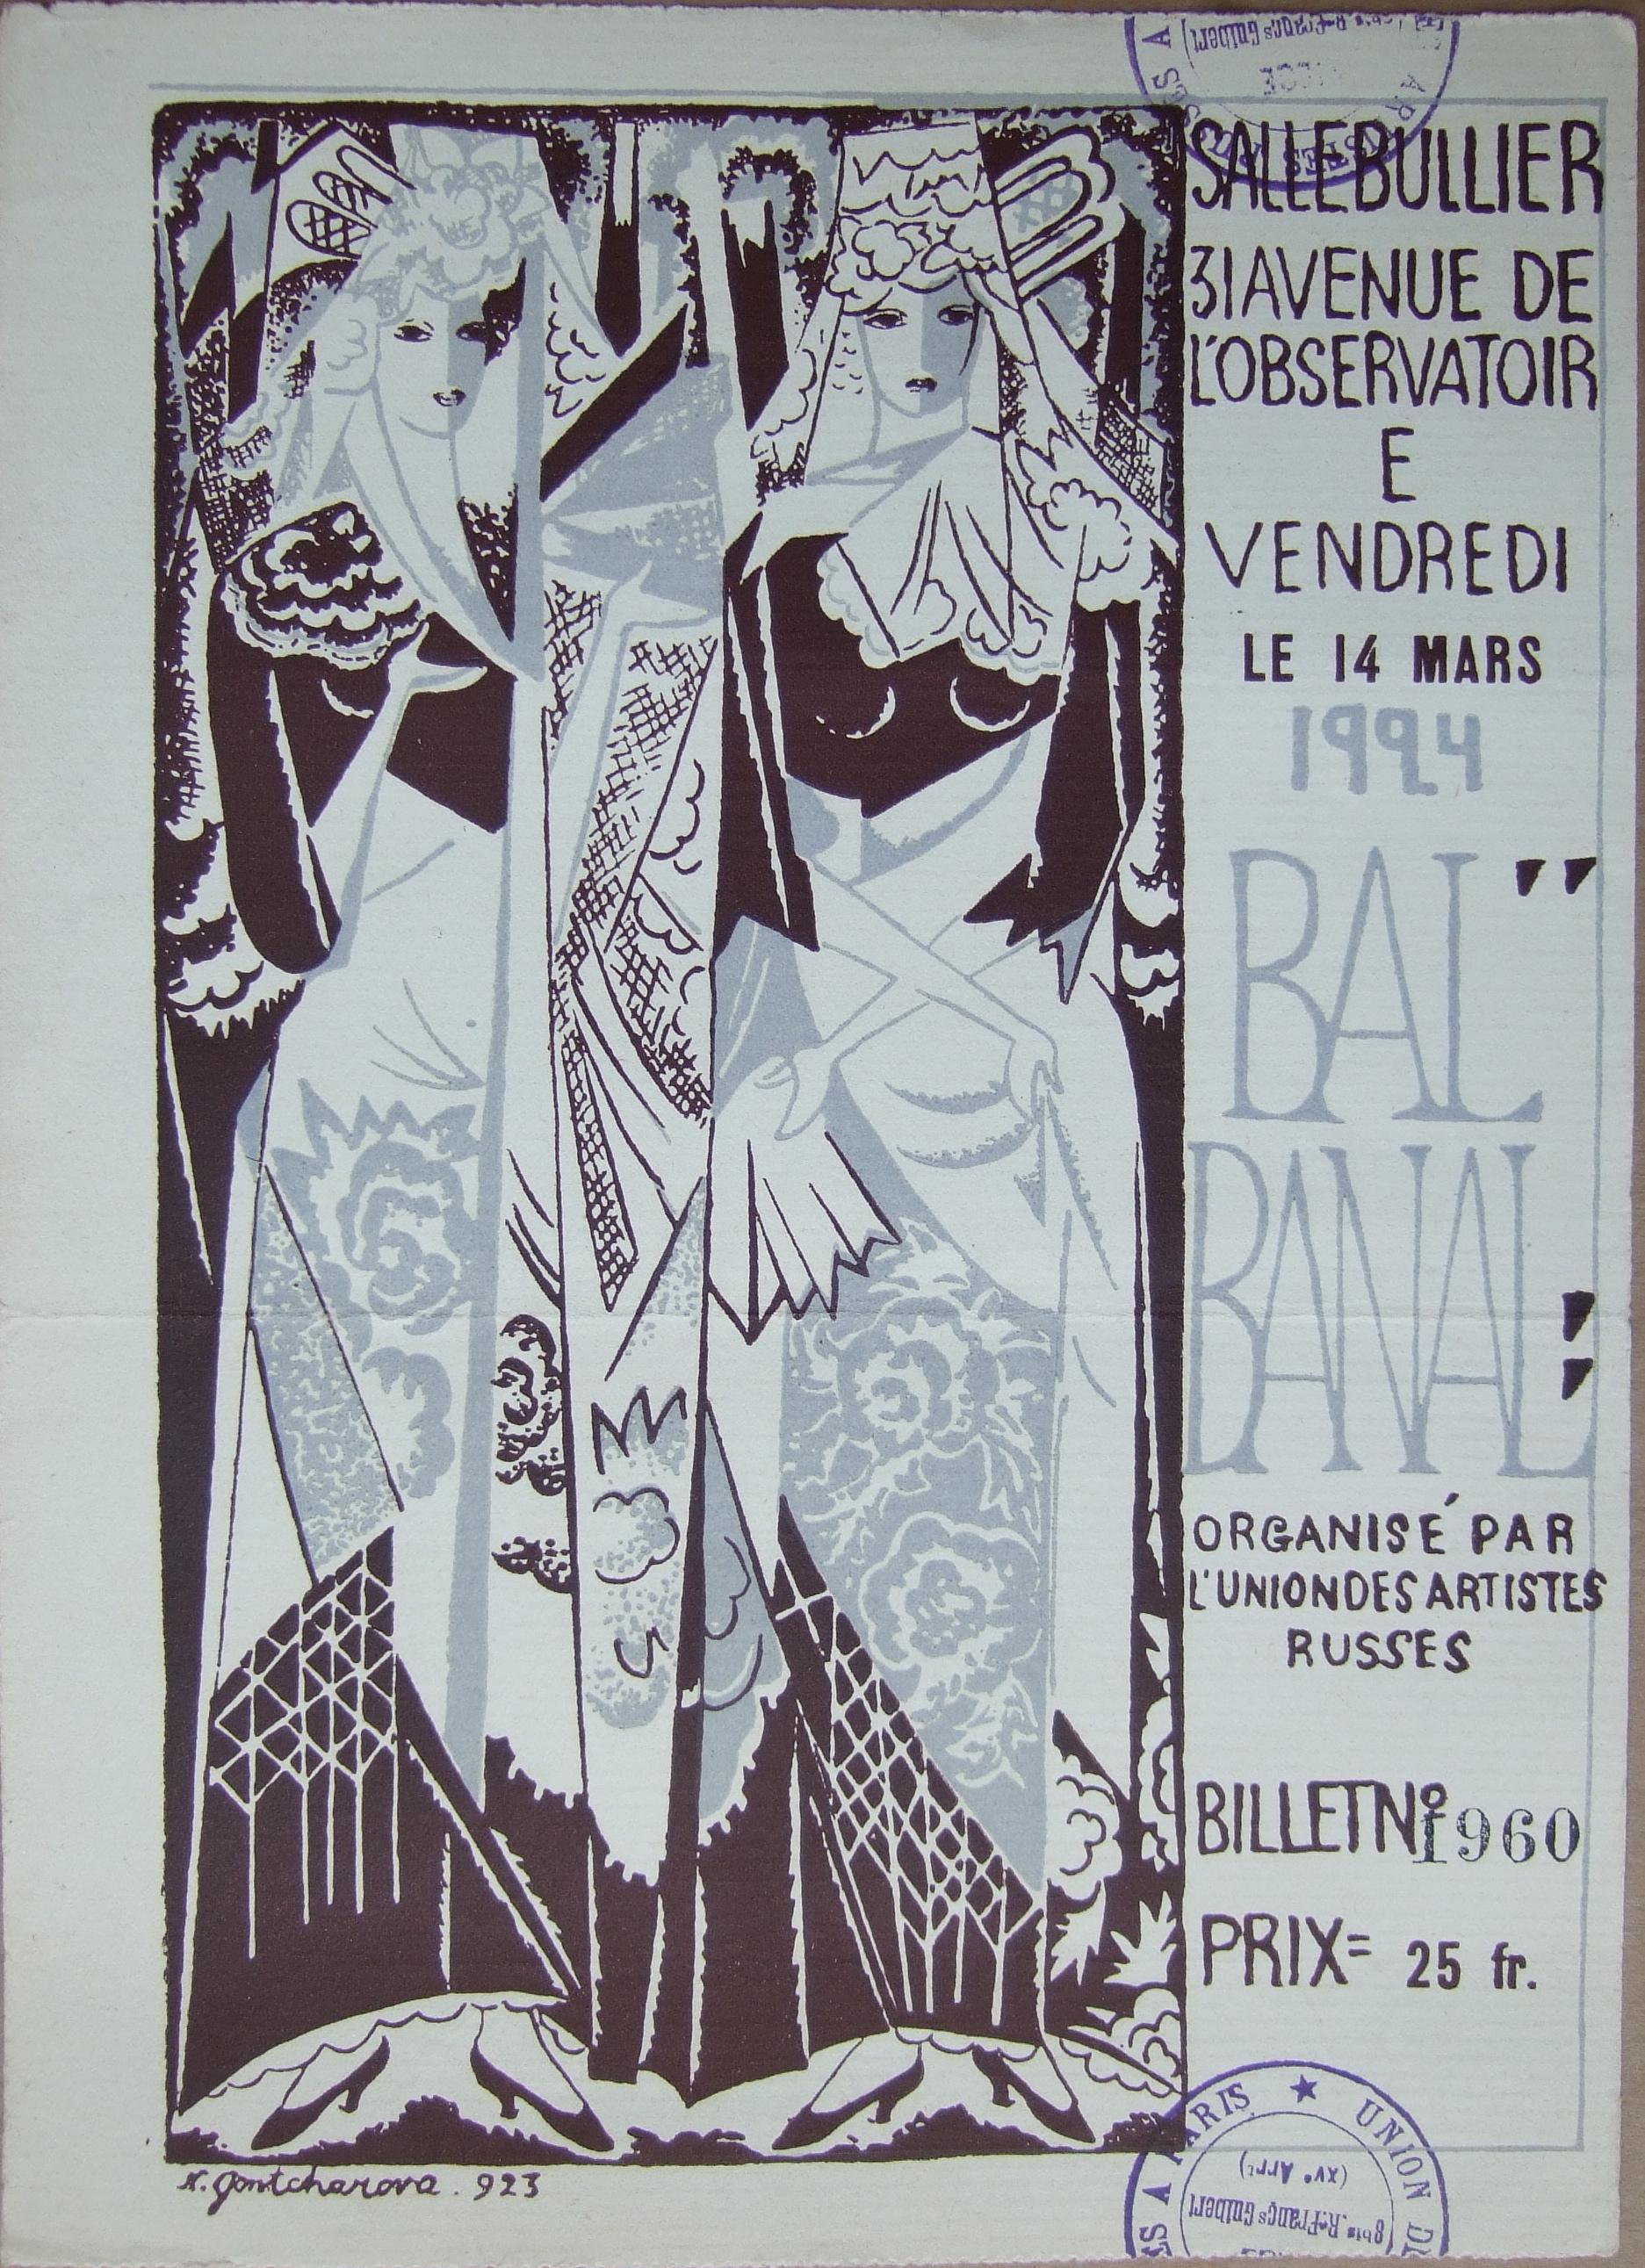 Ticket for BAL BANAL Paris 1924